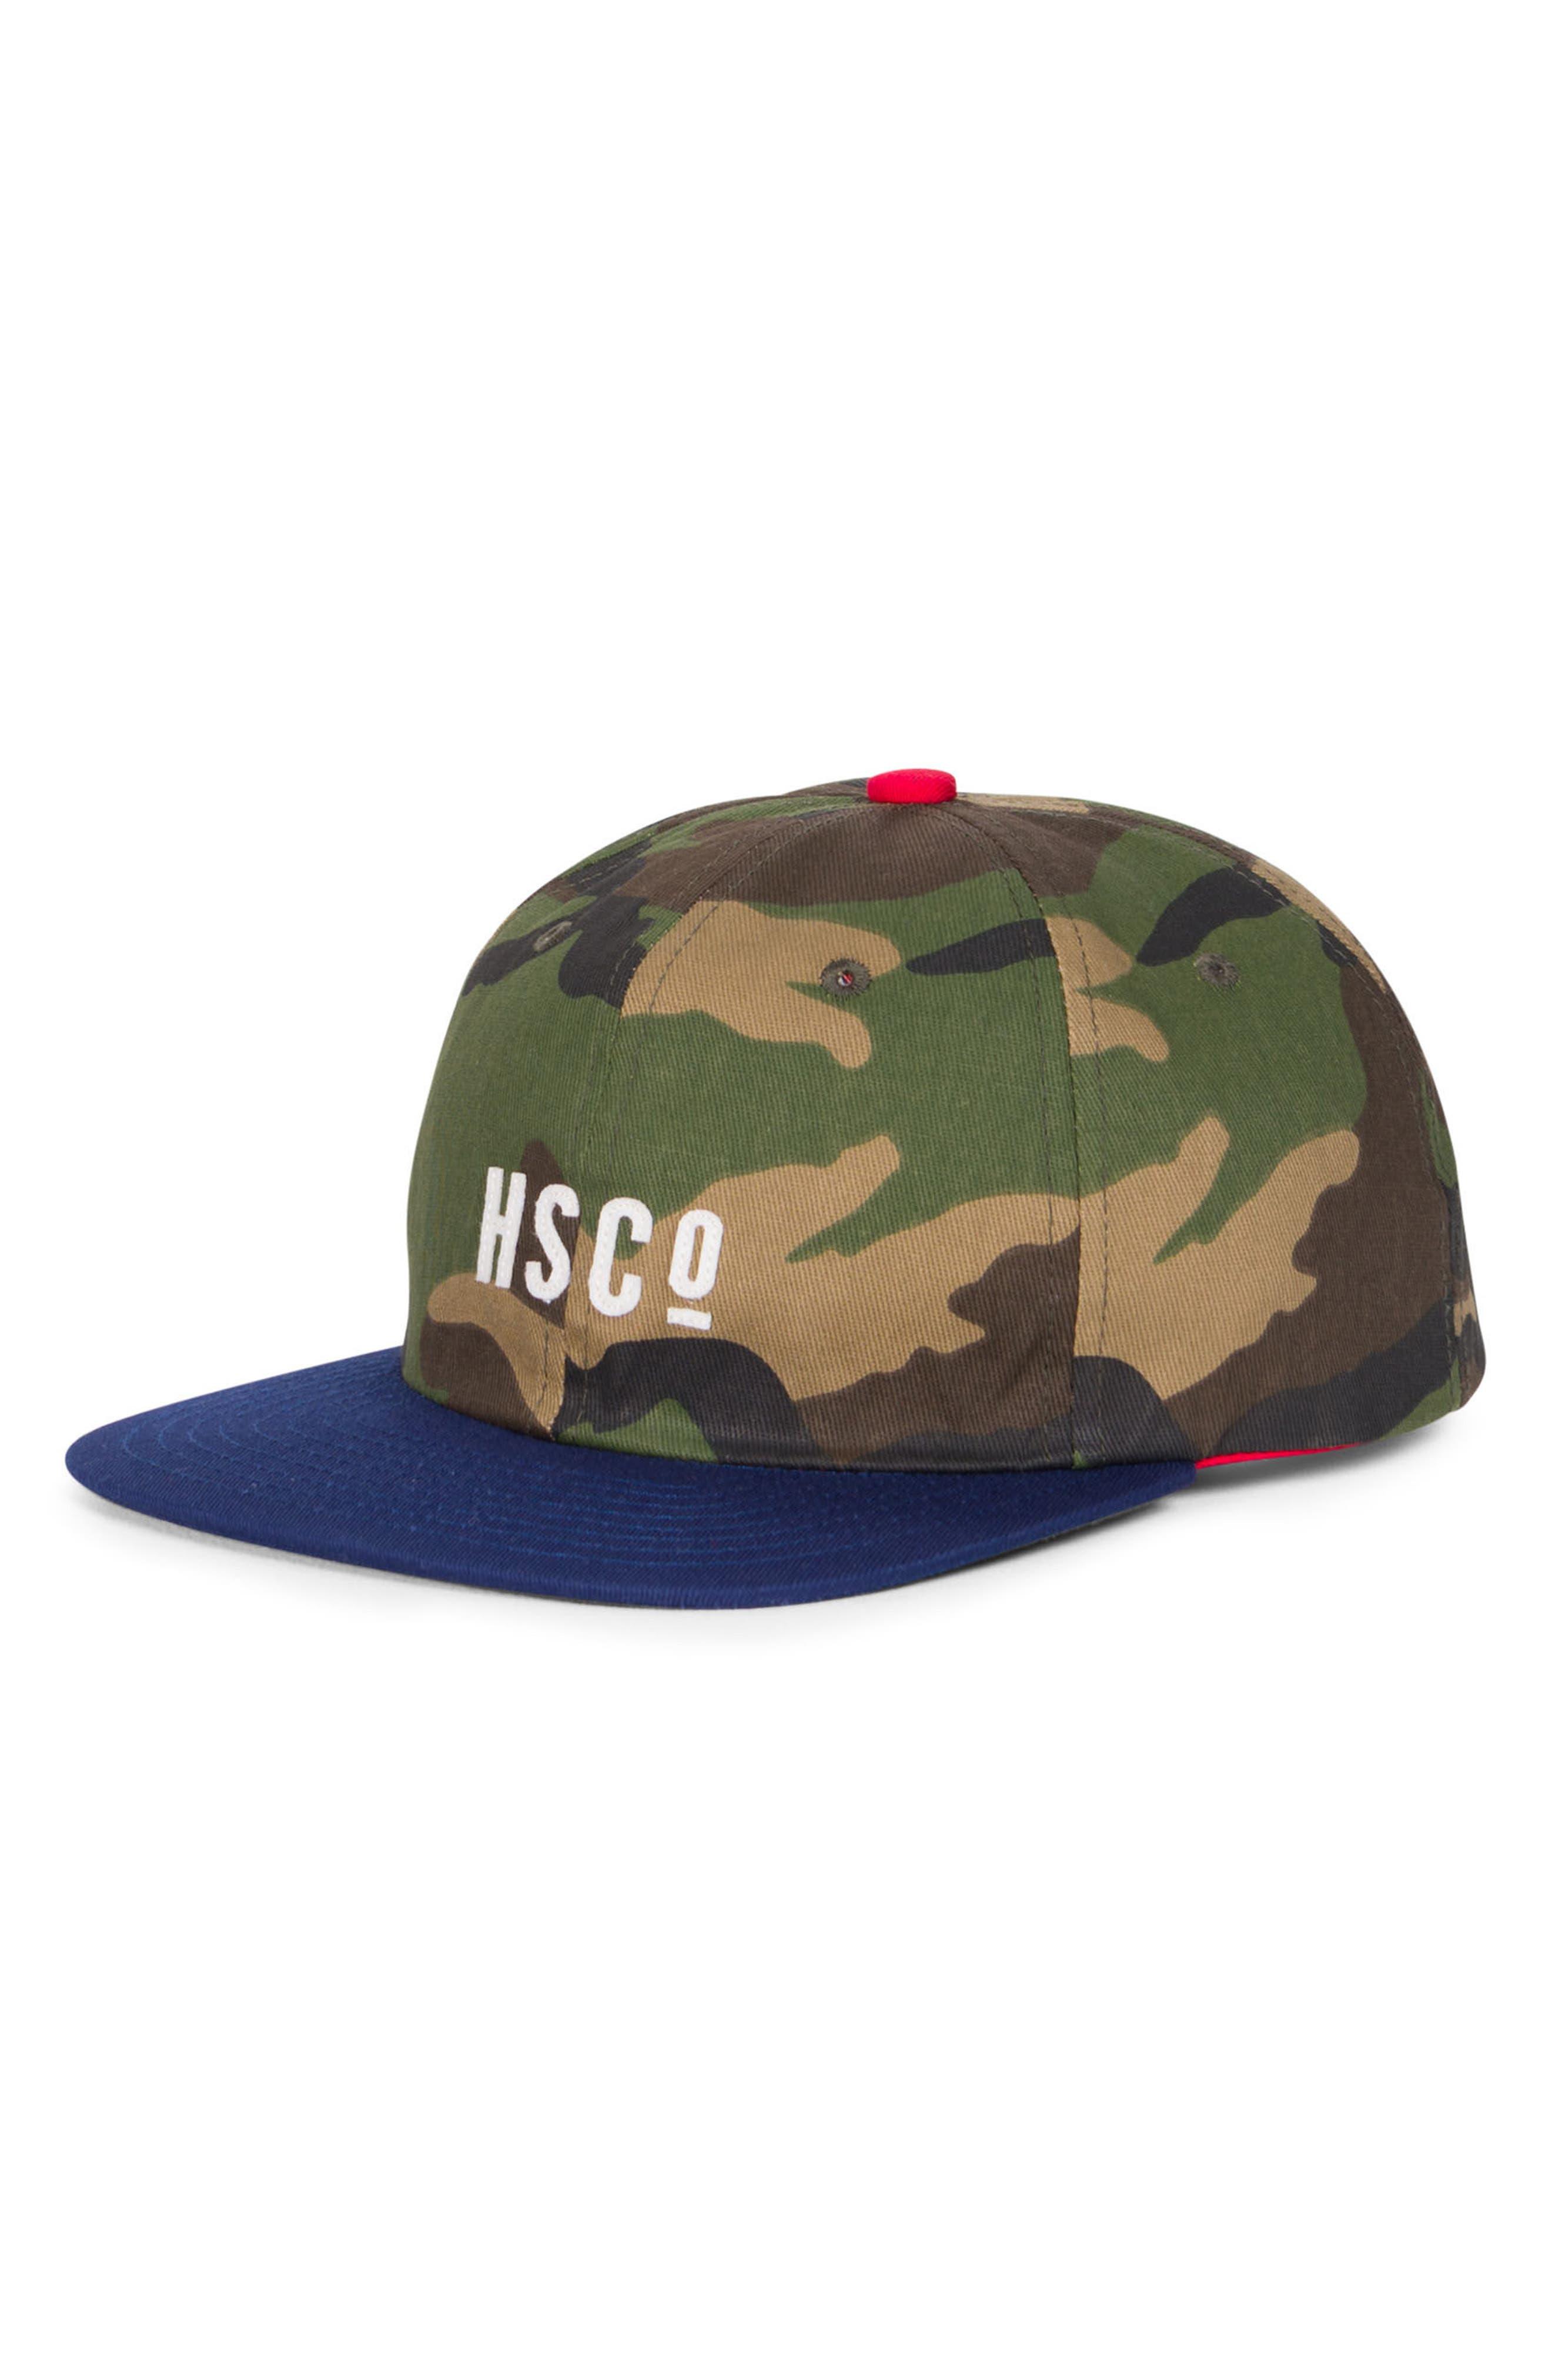 Mosby Camo Snapback Baseball Cap,                             Main thumbnail 1, color,                             Woodland Camo/ Navy/ Red